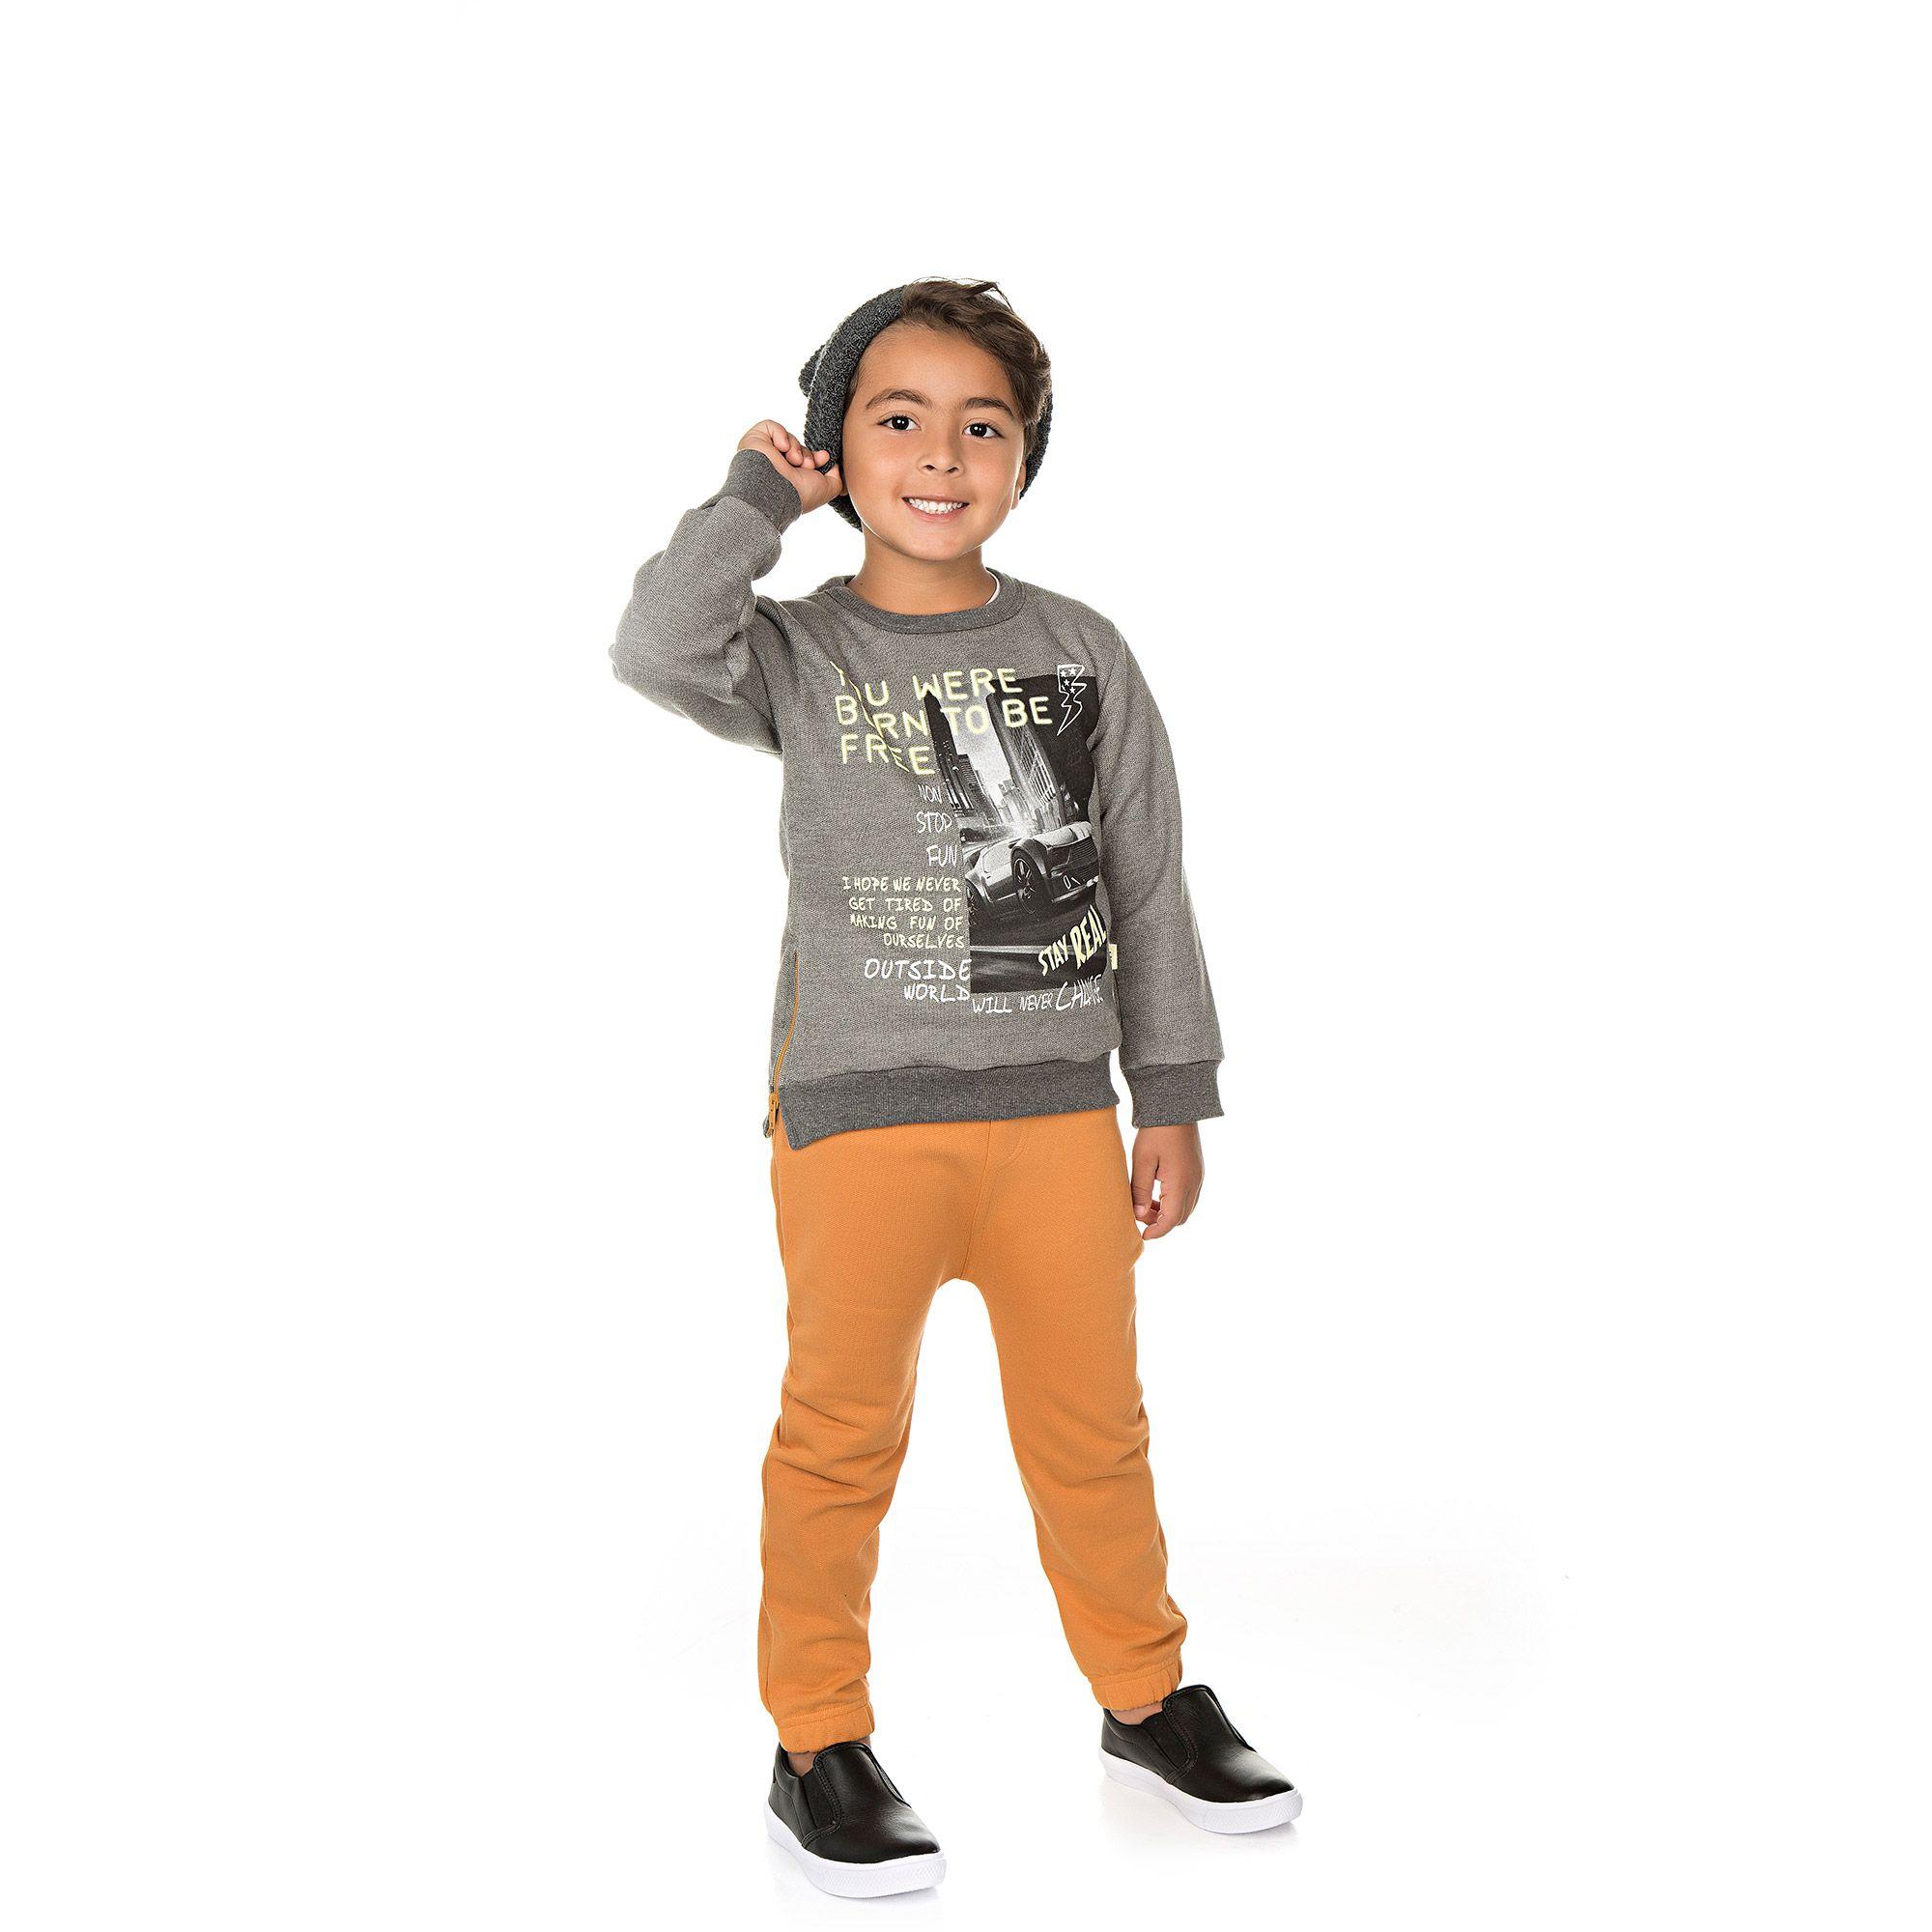 Conjunto Infantil Masculino  - Ref 5014 - Mescla/Amêndoa